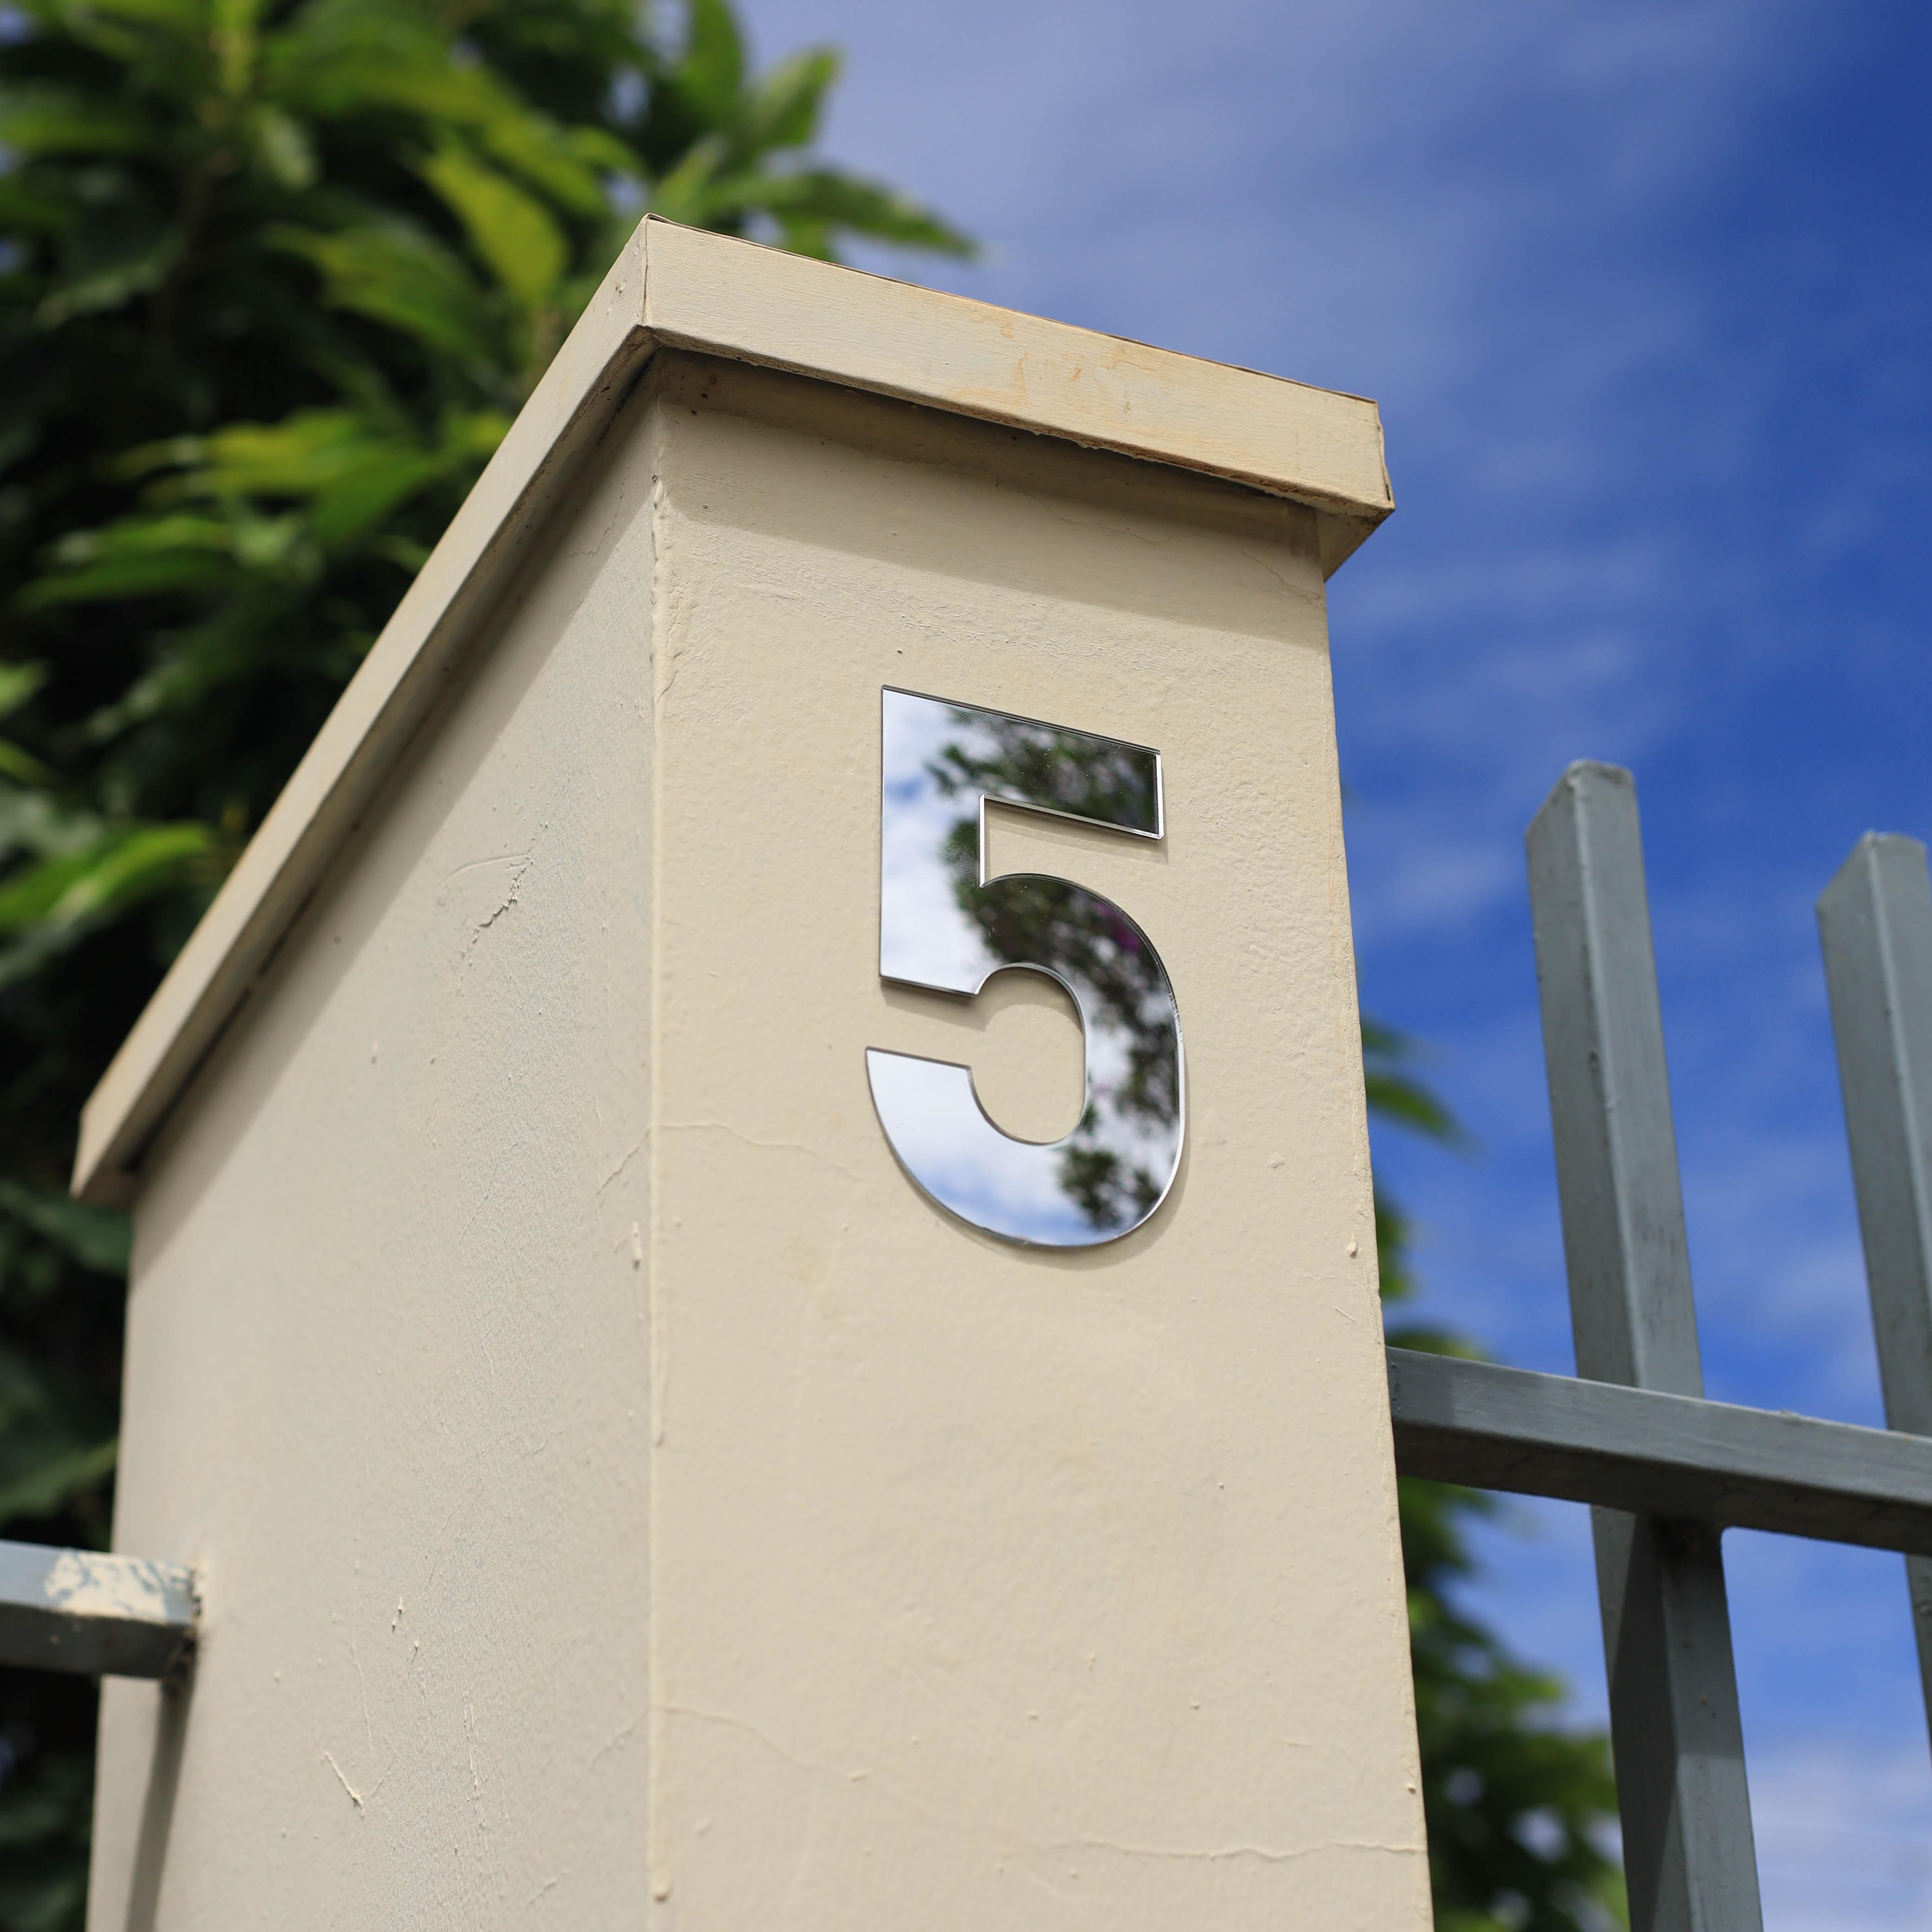 Número Residencial Prata Brilhante Dupla Face - 13 cm